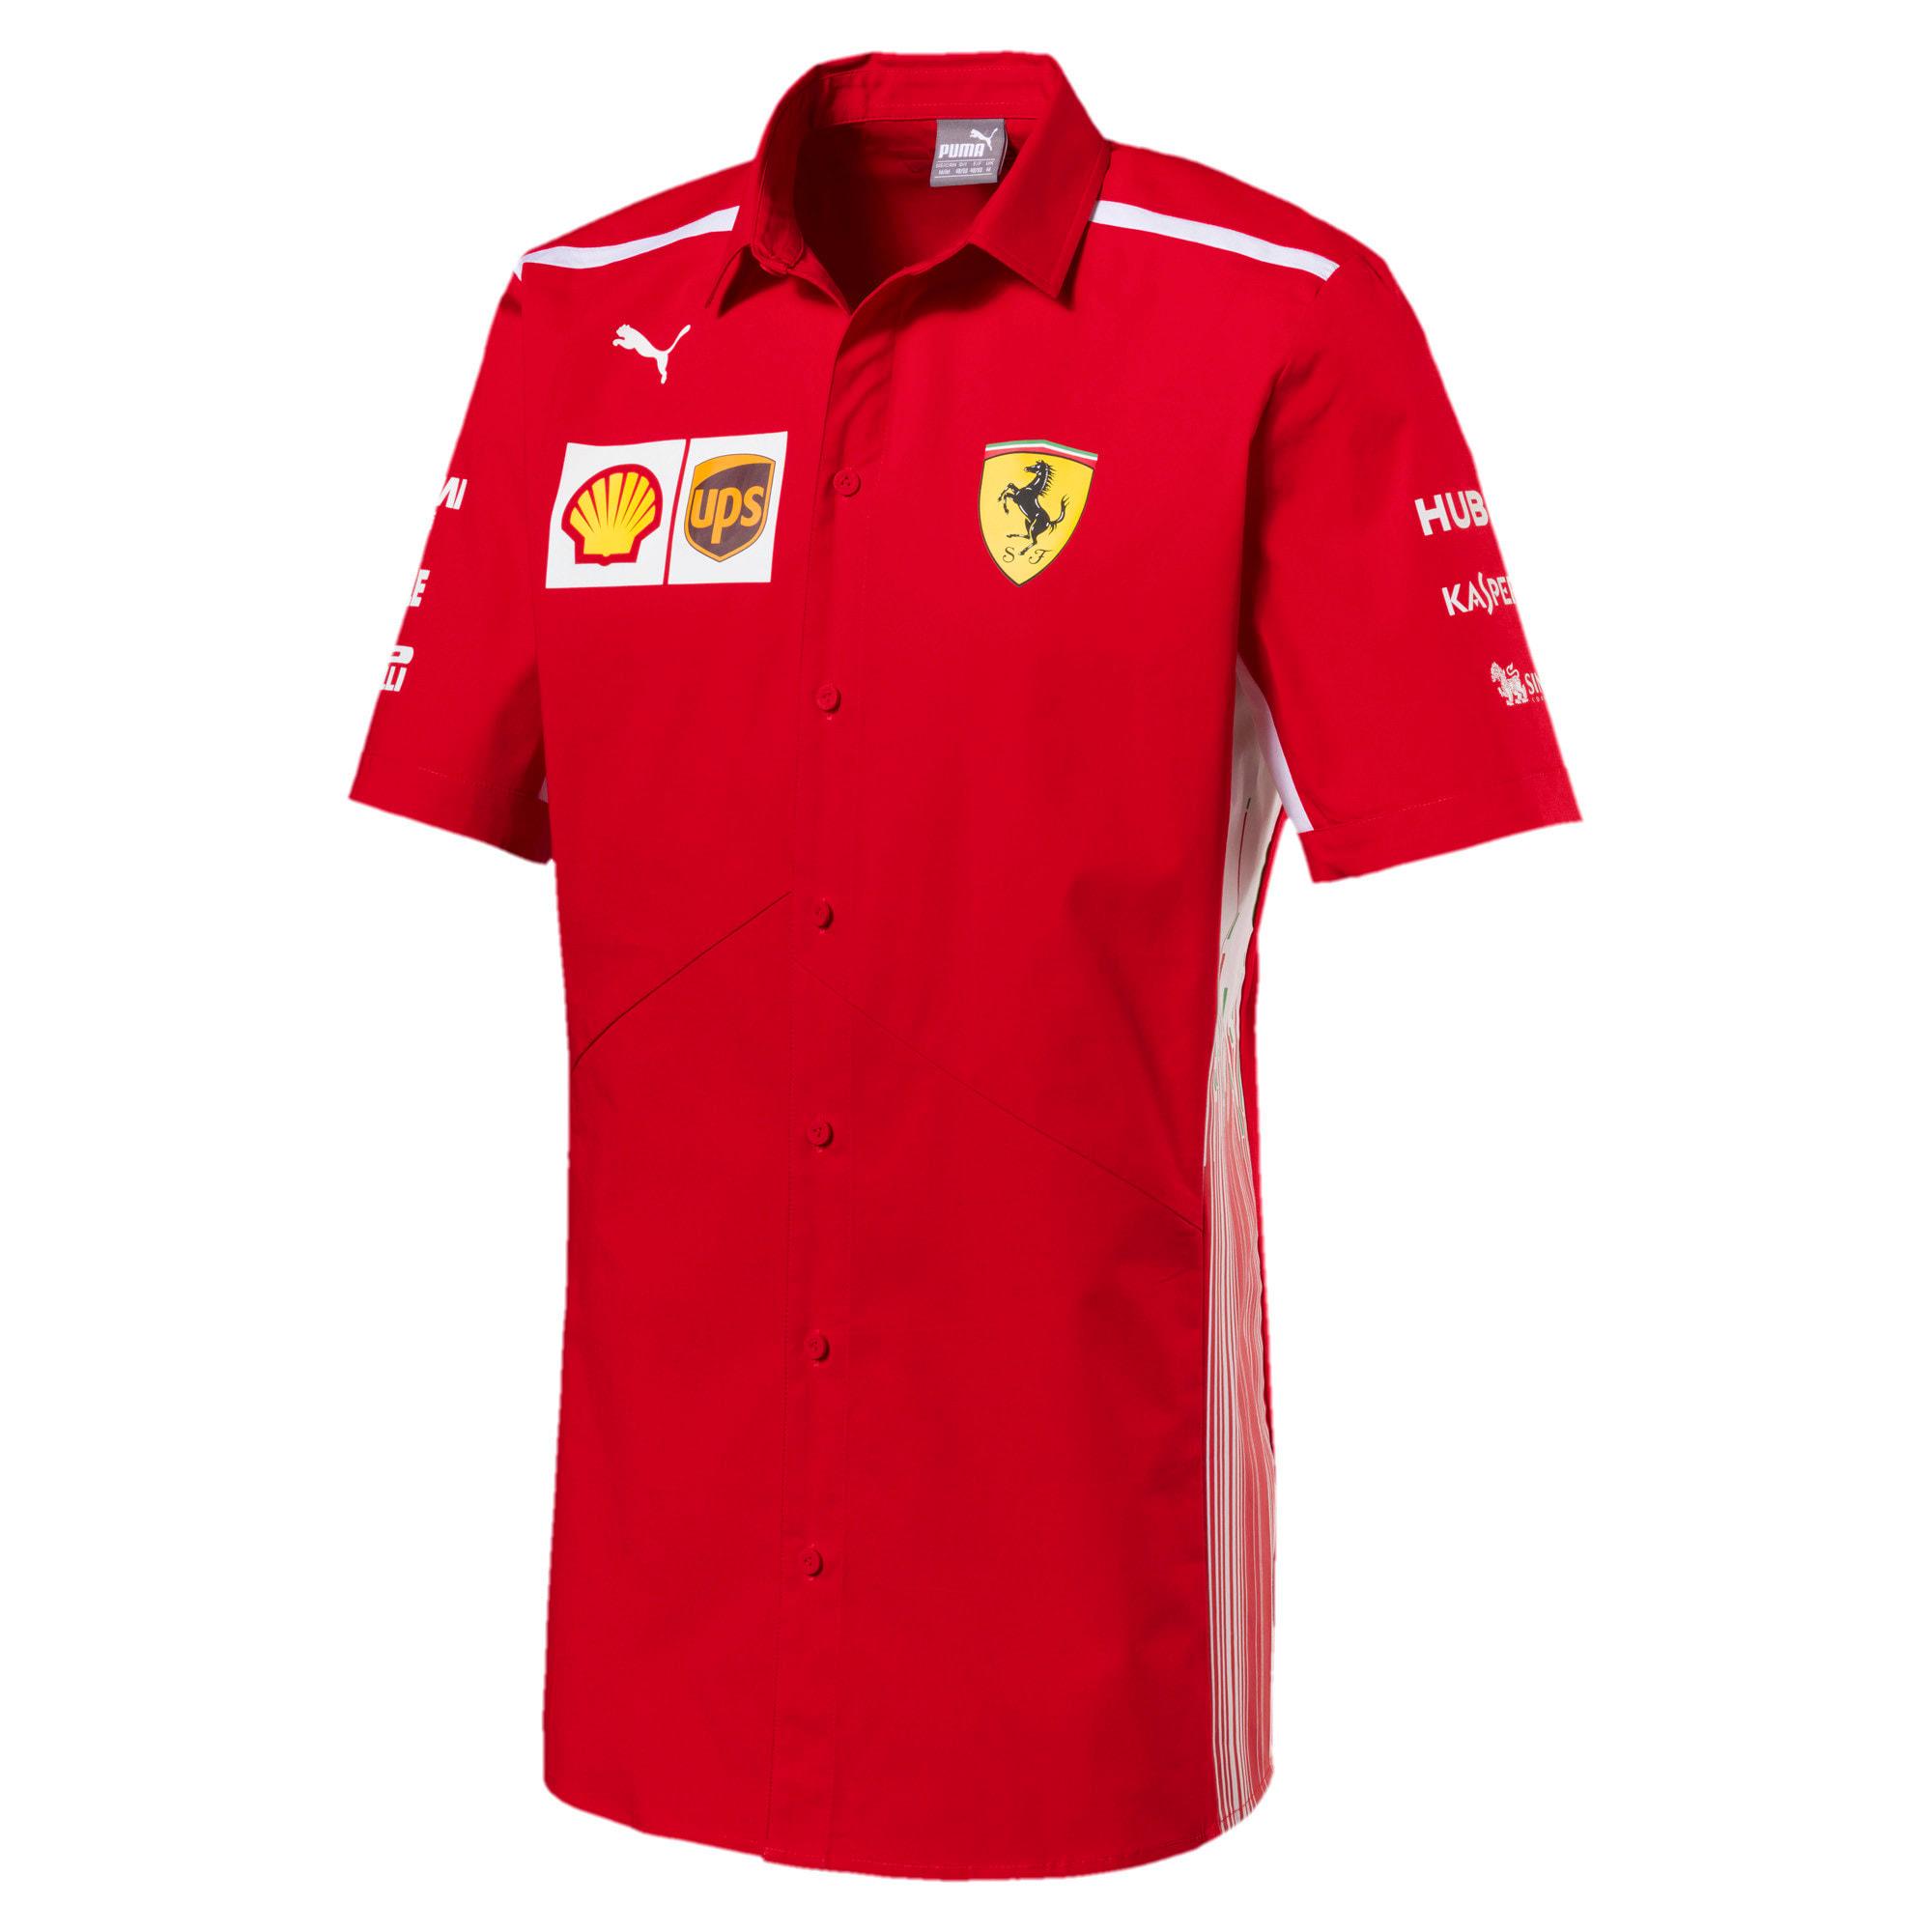 Thumbnail 1 of Scuderia Ferrari Men's Team Shirt, Rosso Corsa, medium